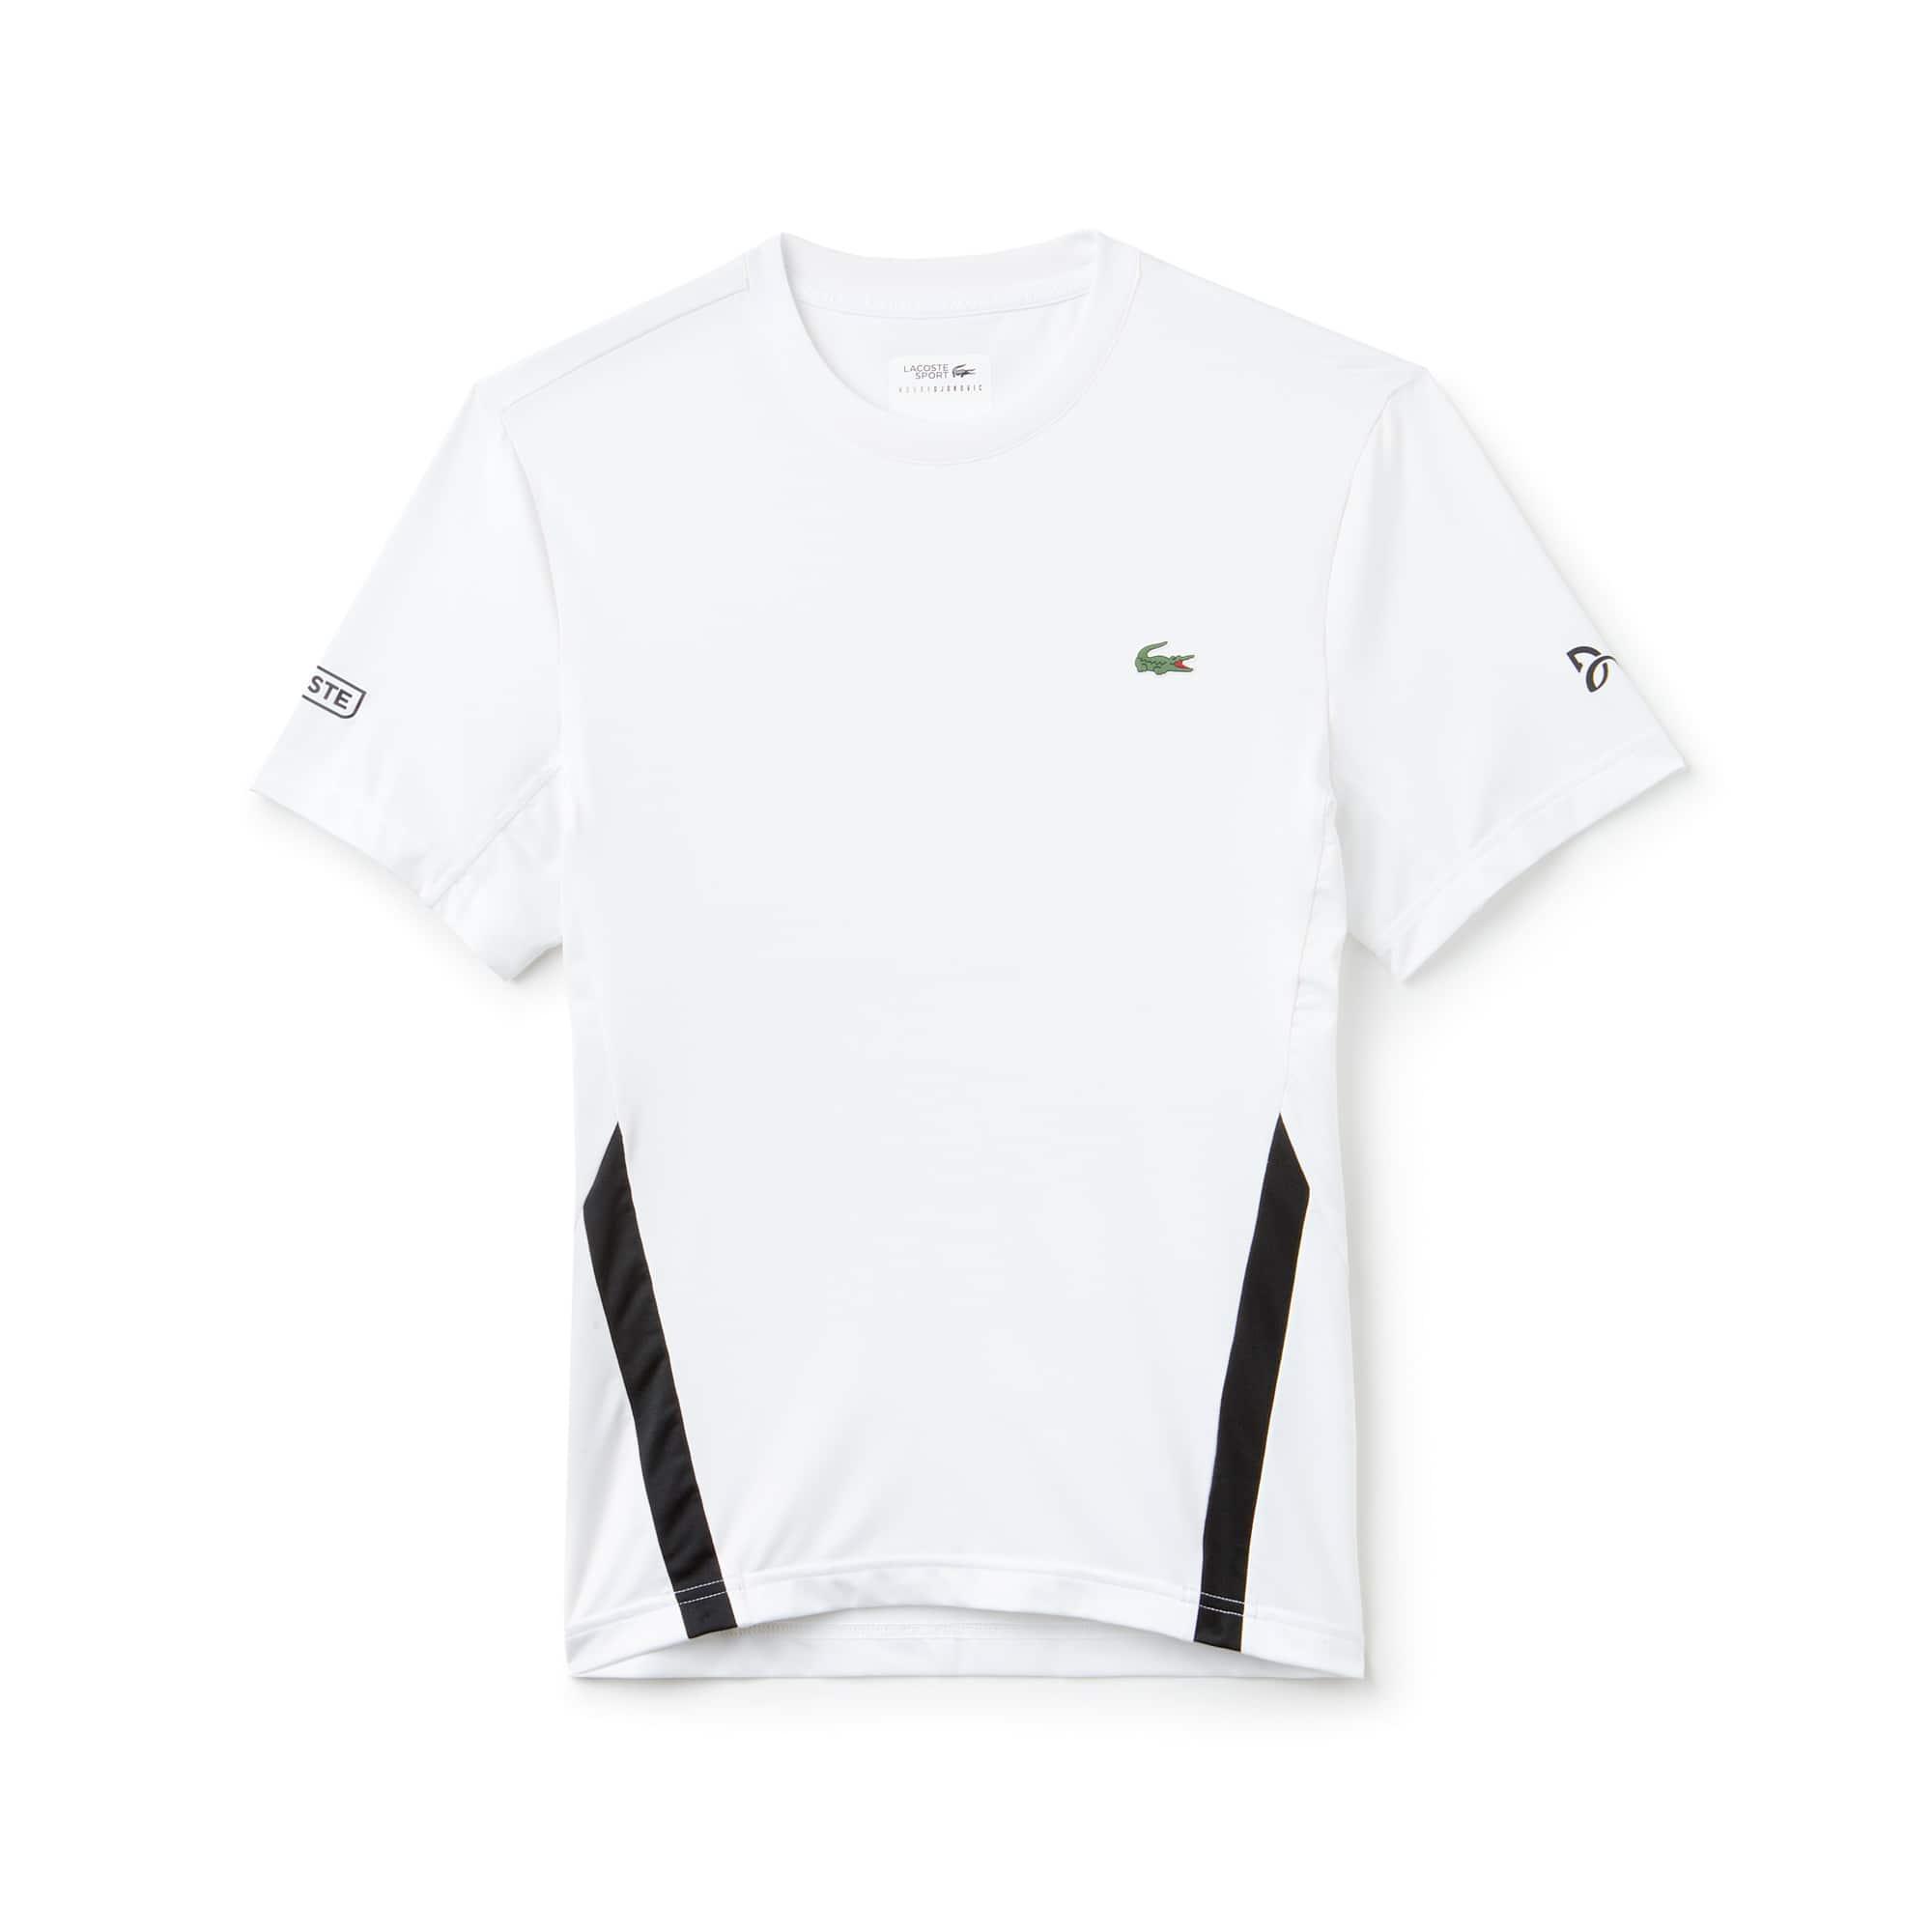 Men's Lacoste SPORT NOVAK DJOKOVIC-OFF COURT COLLECTION Crew Neck Stretch Technical Jersey T-shirt